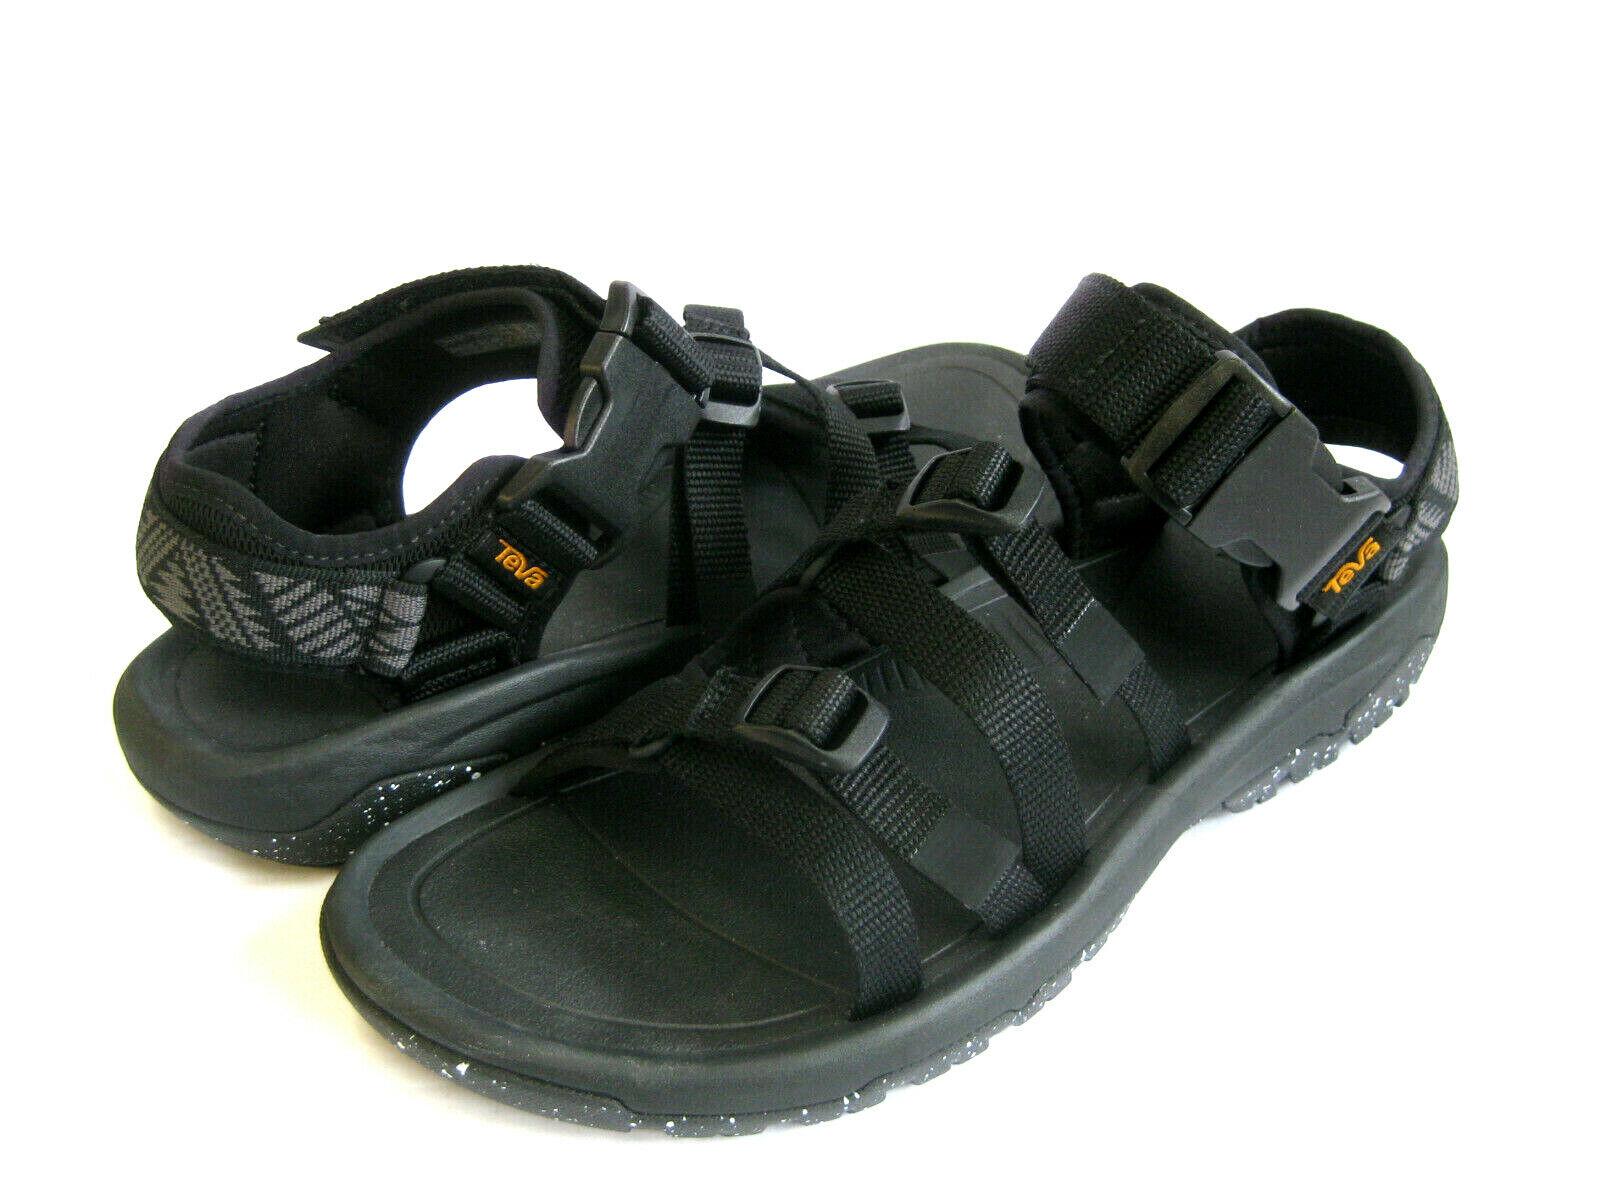 TEVA HURRICAN XLT2 ALP Hombres Sport sandlas Negro 12 Estados Unidos Reino Unido 11 UE 45.5